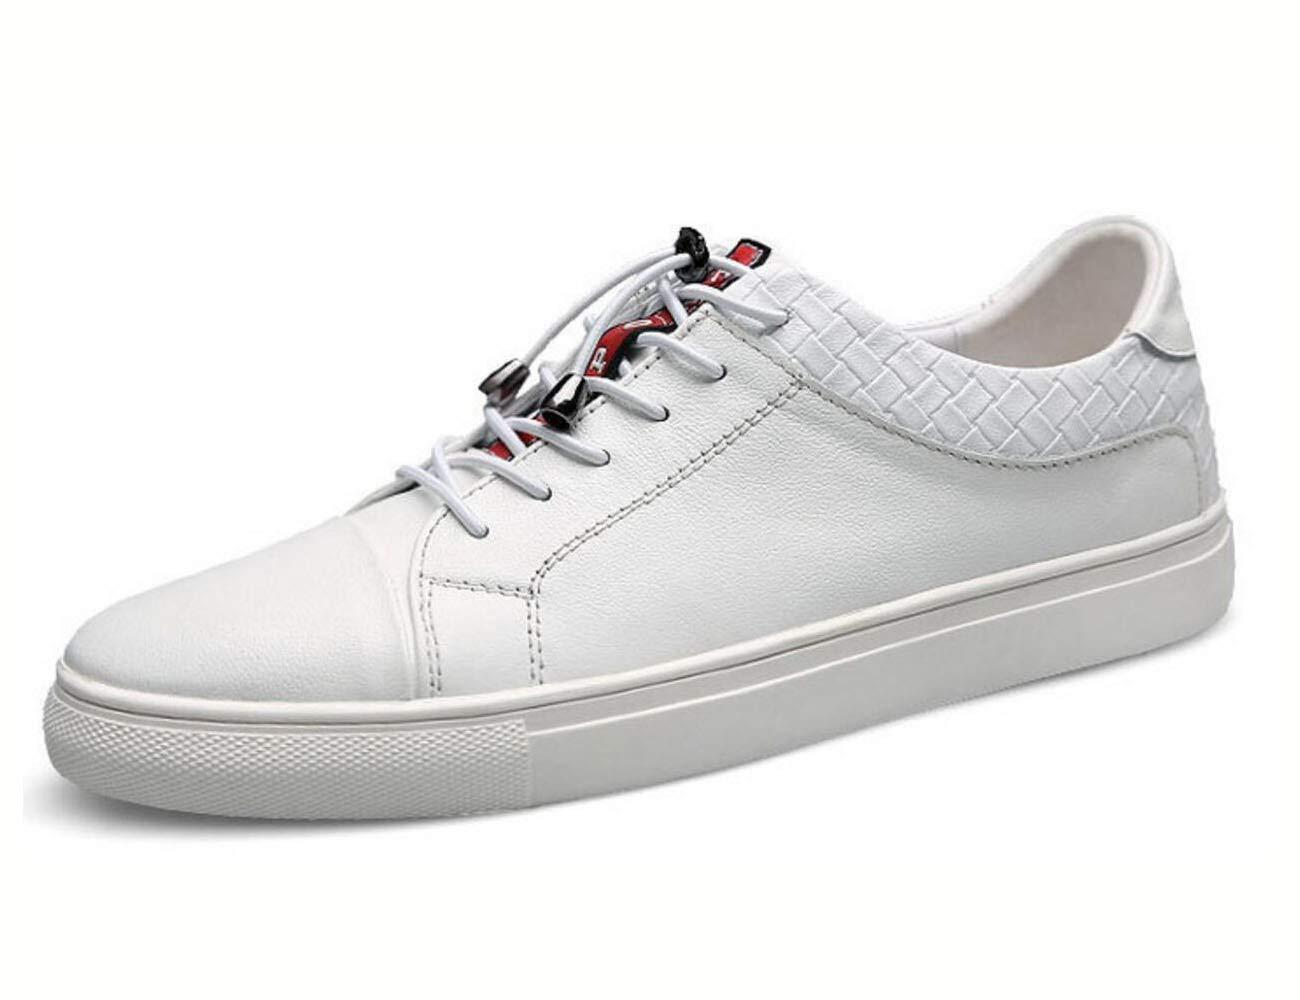 De Jiang Capa Zapatos Zx Para Hombre Piel Primera 77wfEqz